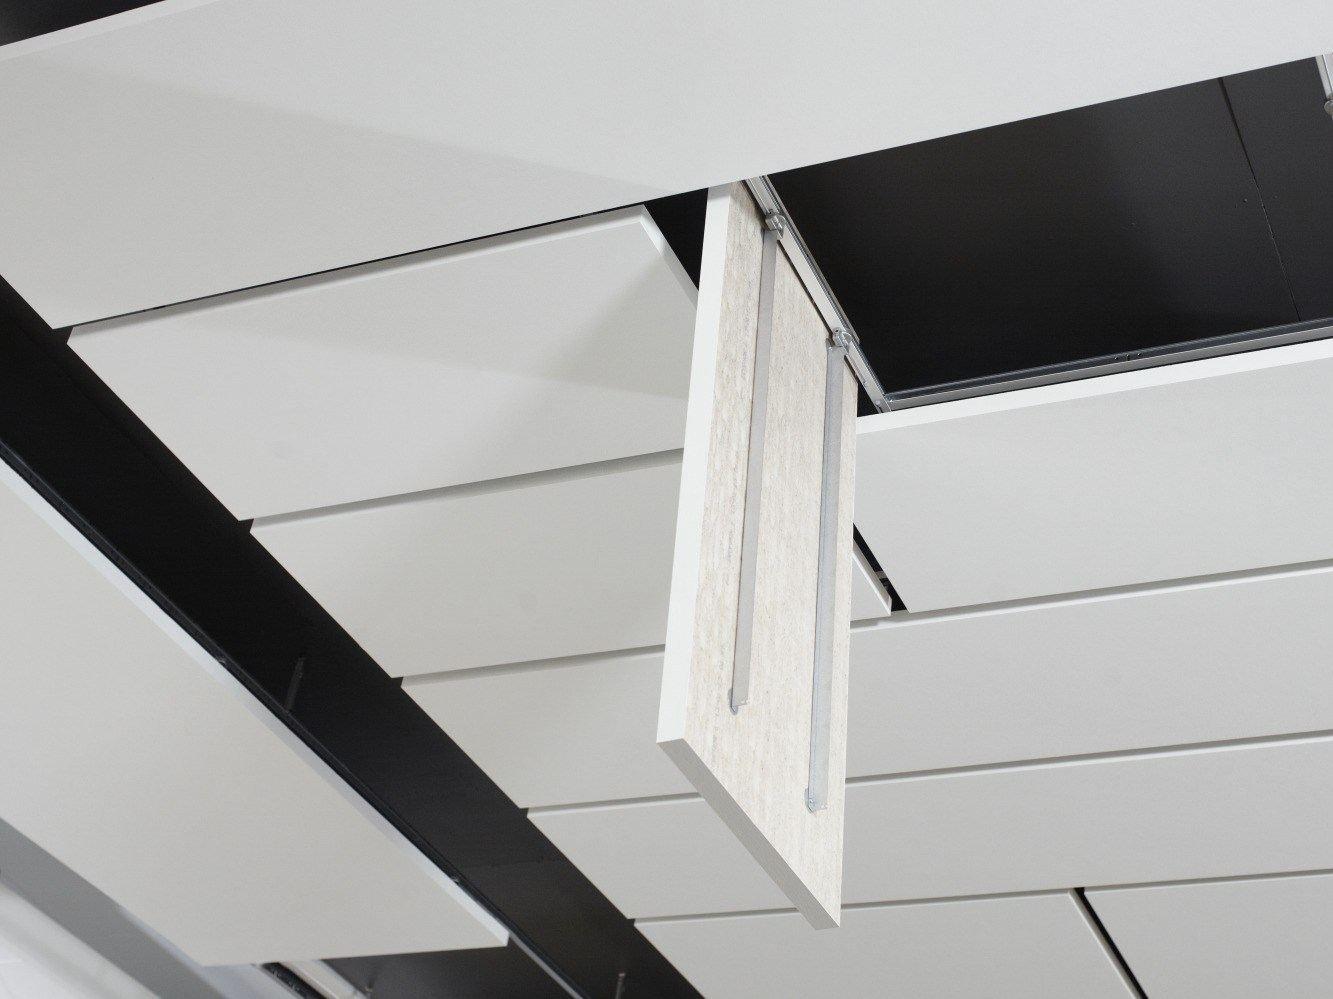 Ecophon ceiling tiles energywarden ecophon ceiling tiles gallery tile flooring design ideas dailygadgetfo Images